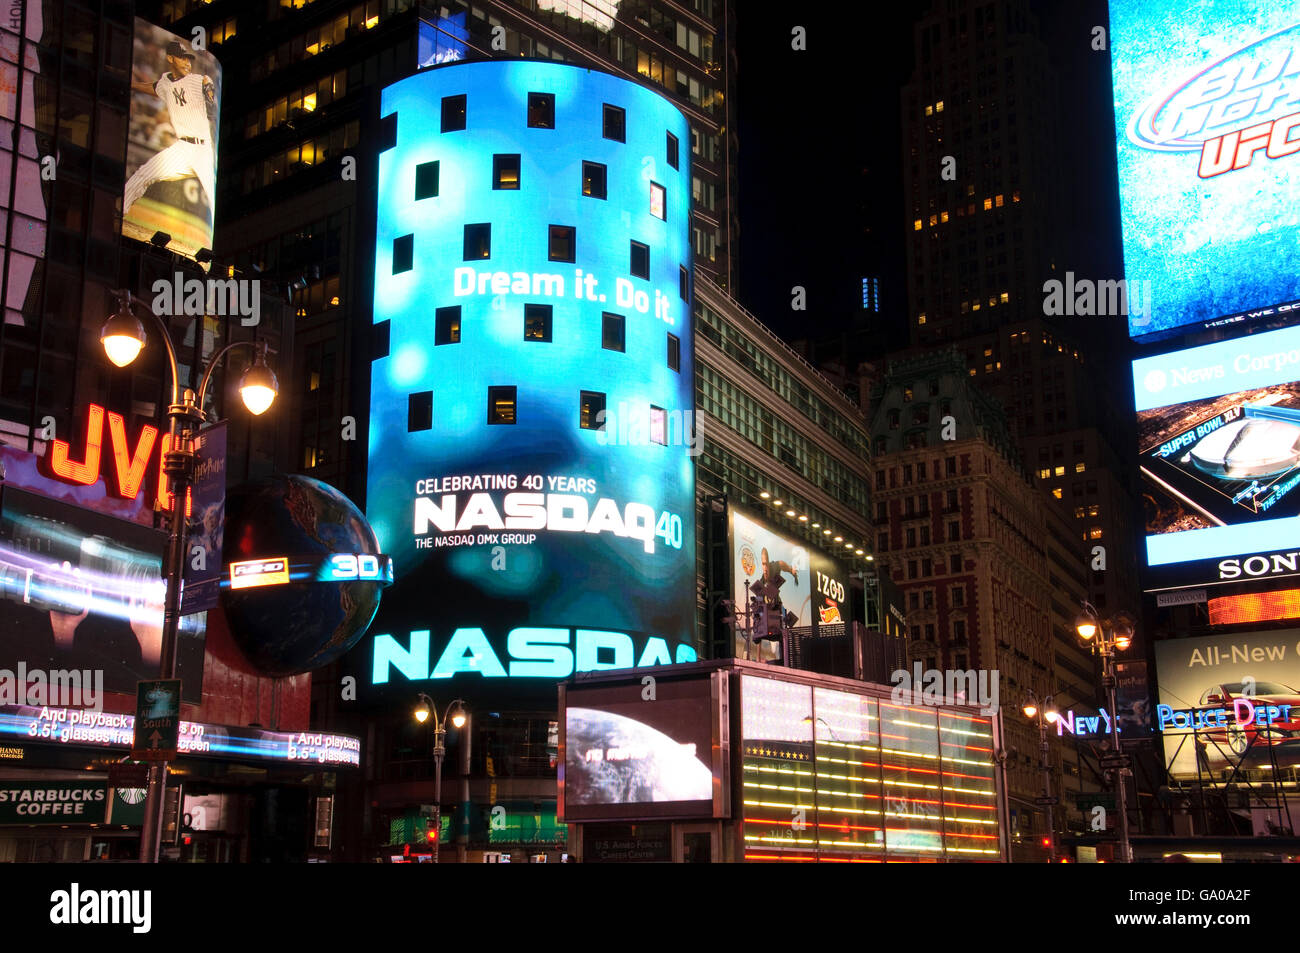 Nasdaq building, Times Square, 42nd Street, New York City, New York, USA - Stock Image